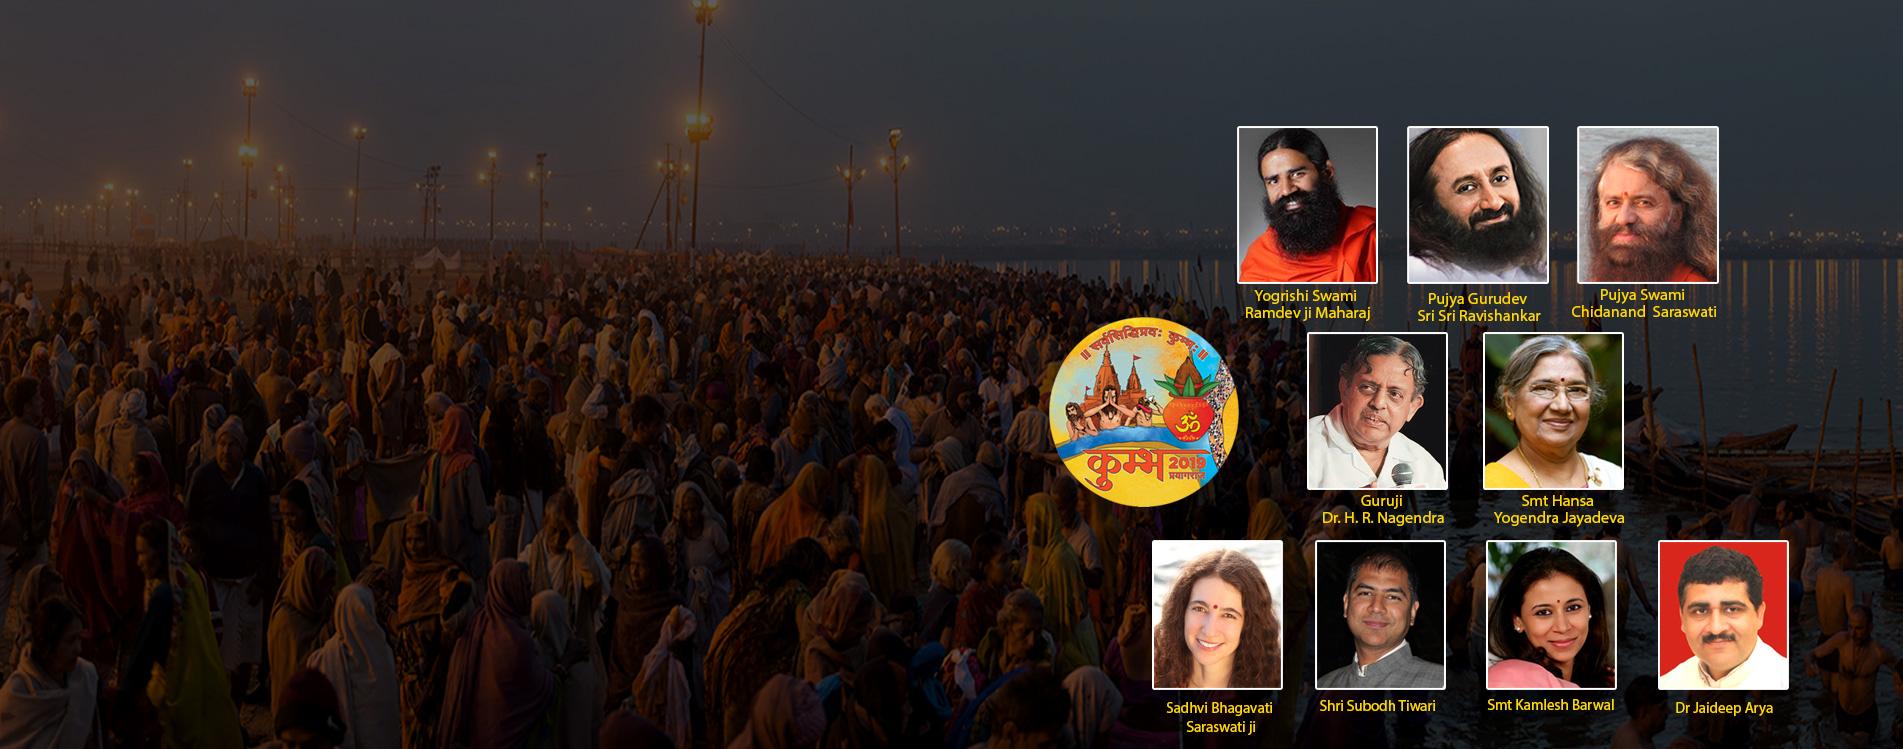 Yoga-Kumbh-2019-iya